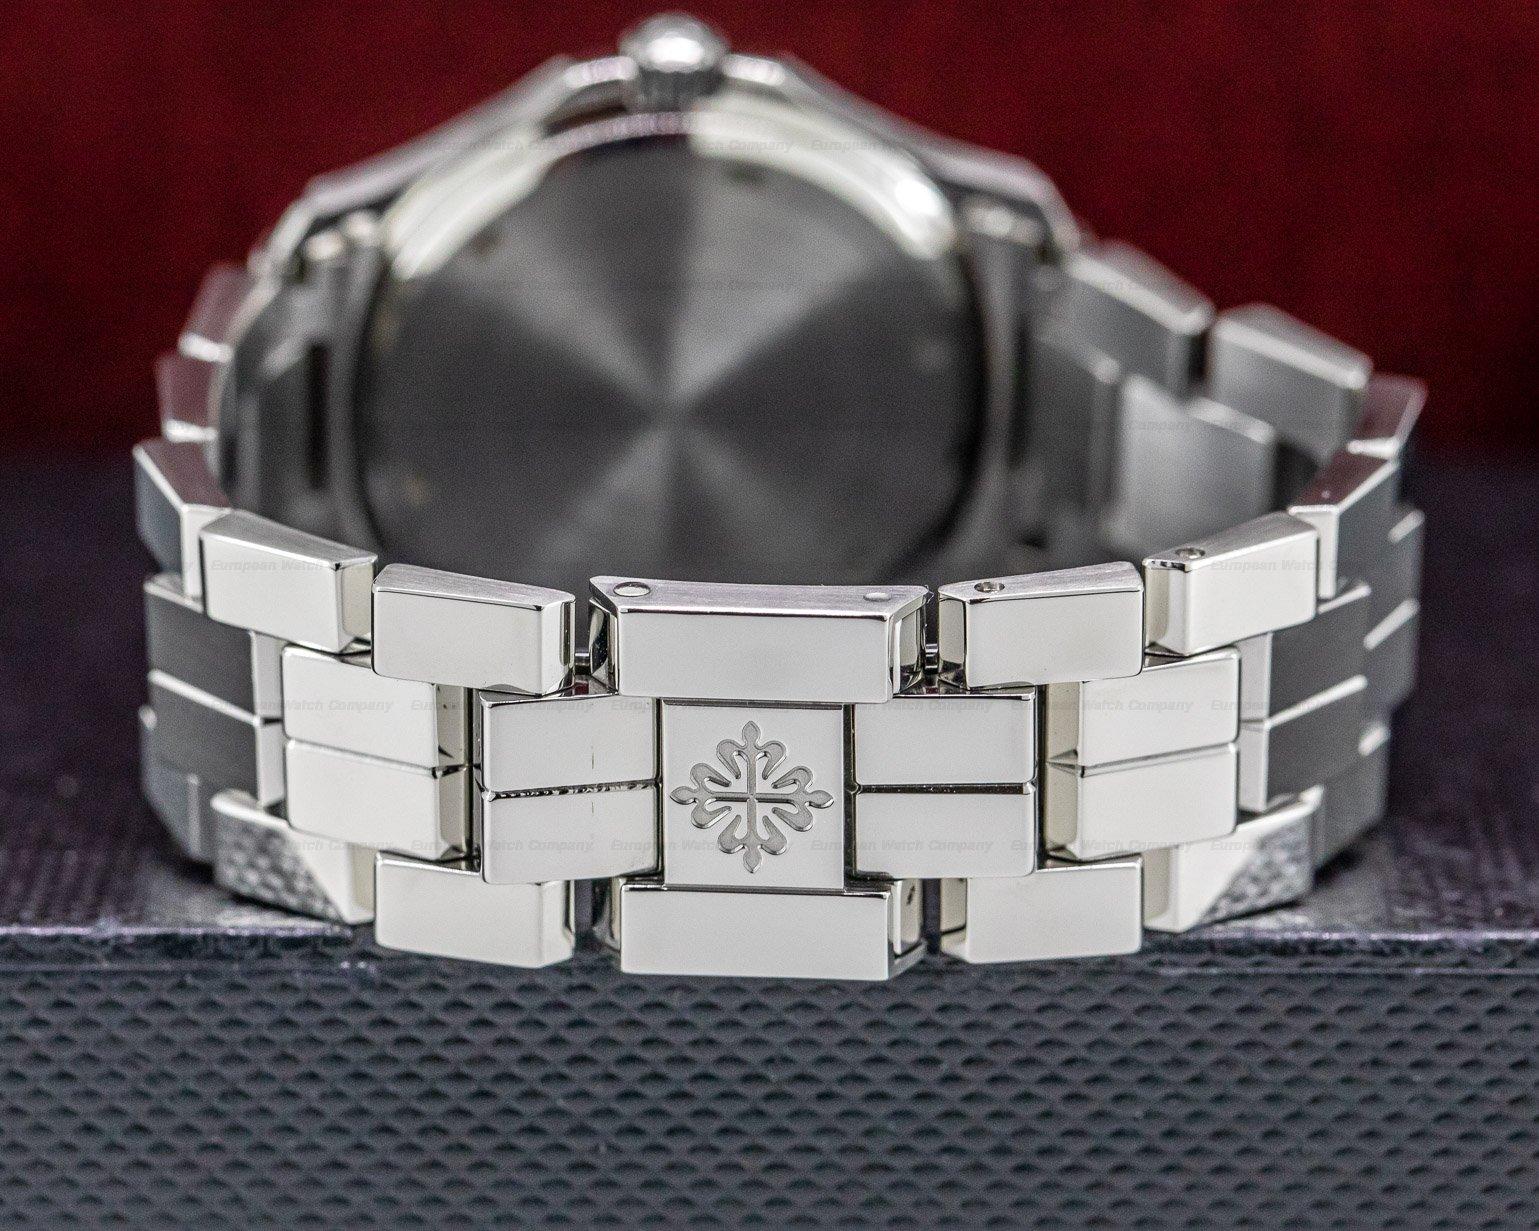 Patek Philippe 5060A-001 Aquanaut Automatic 5060A / Bracelet FULL SET